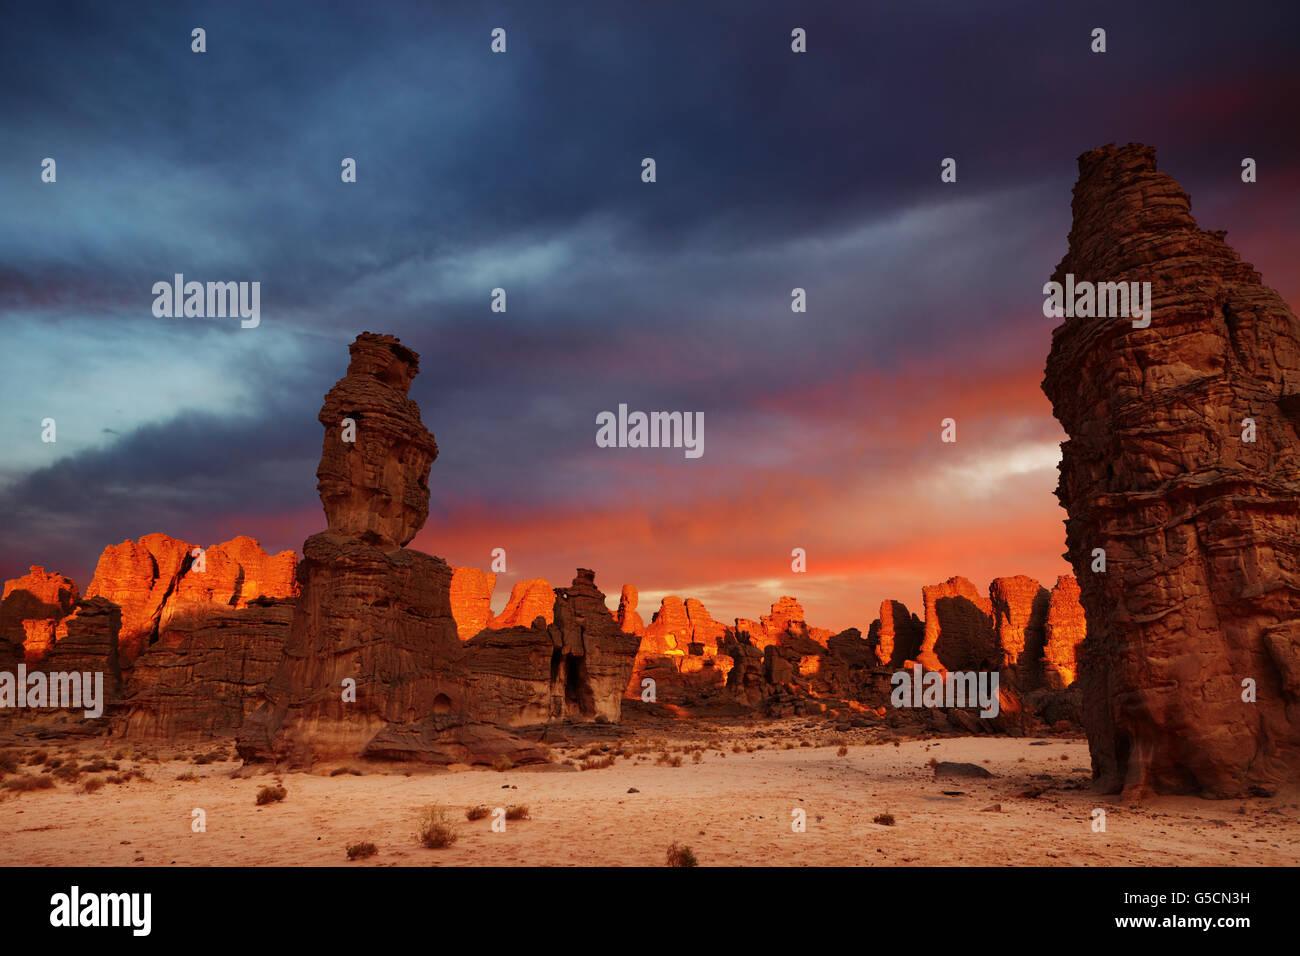 Dramatic sunrise in Sahara Desert, Tassili N'Ajjer, Algeria - Stock Image